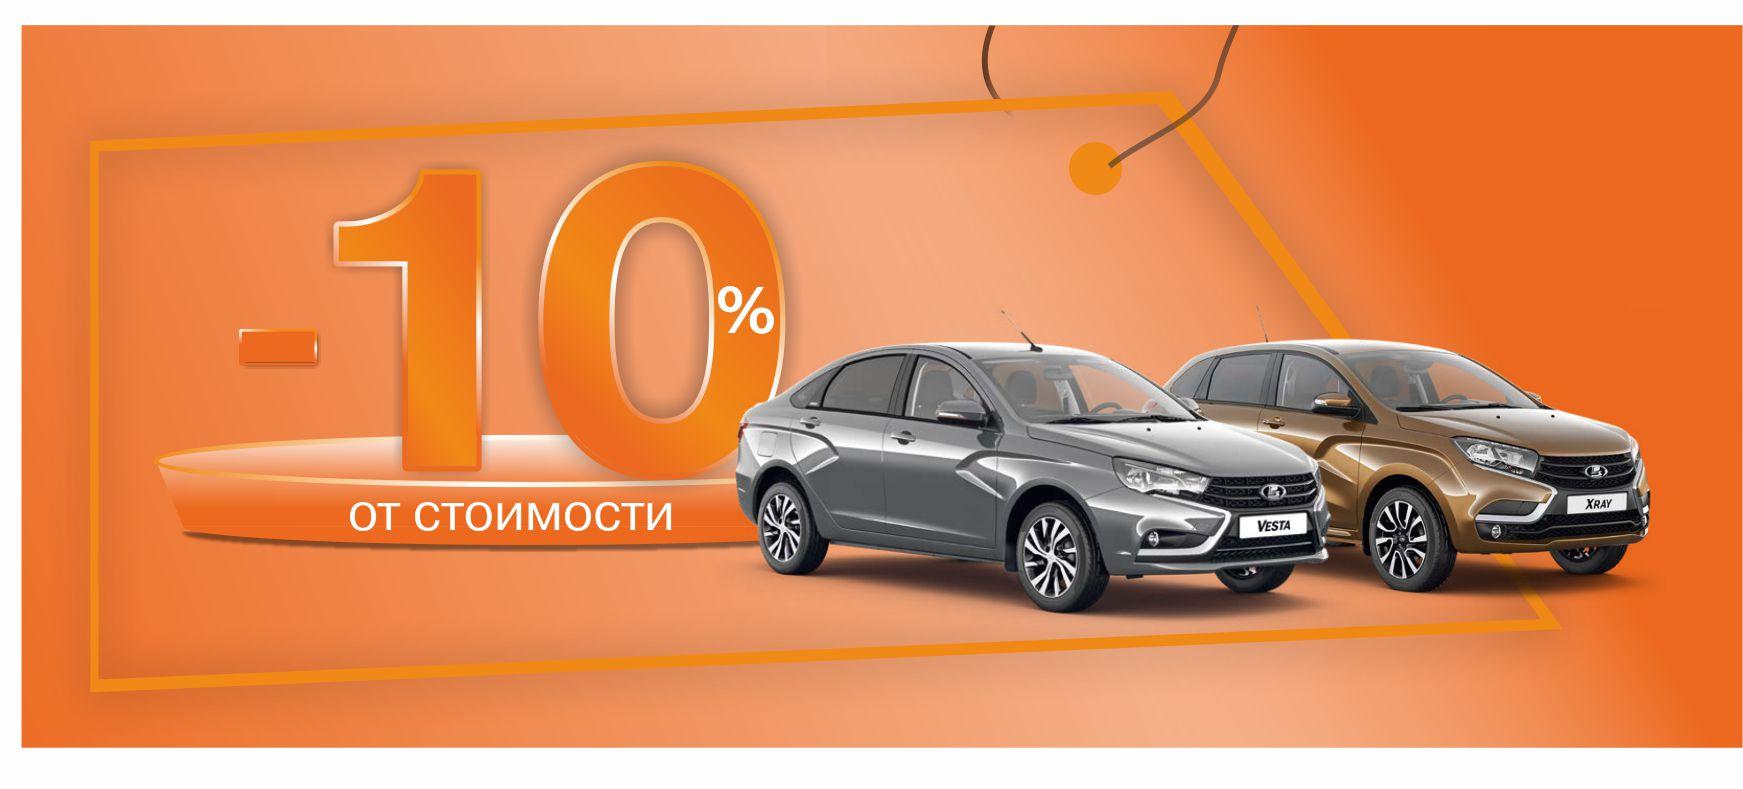 Минус 10% от стоимости автомобиля!